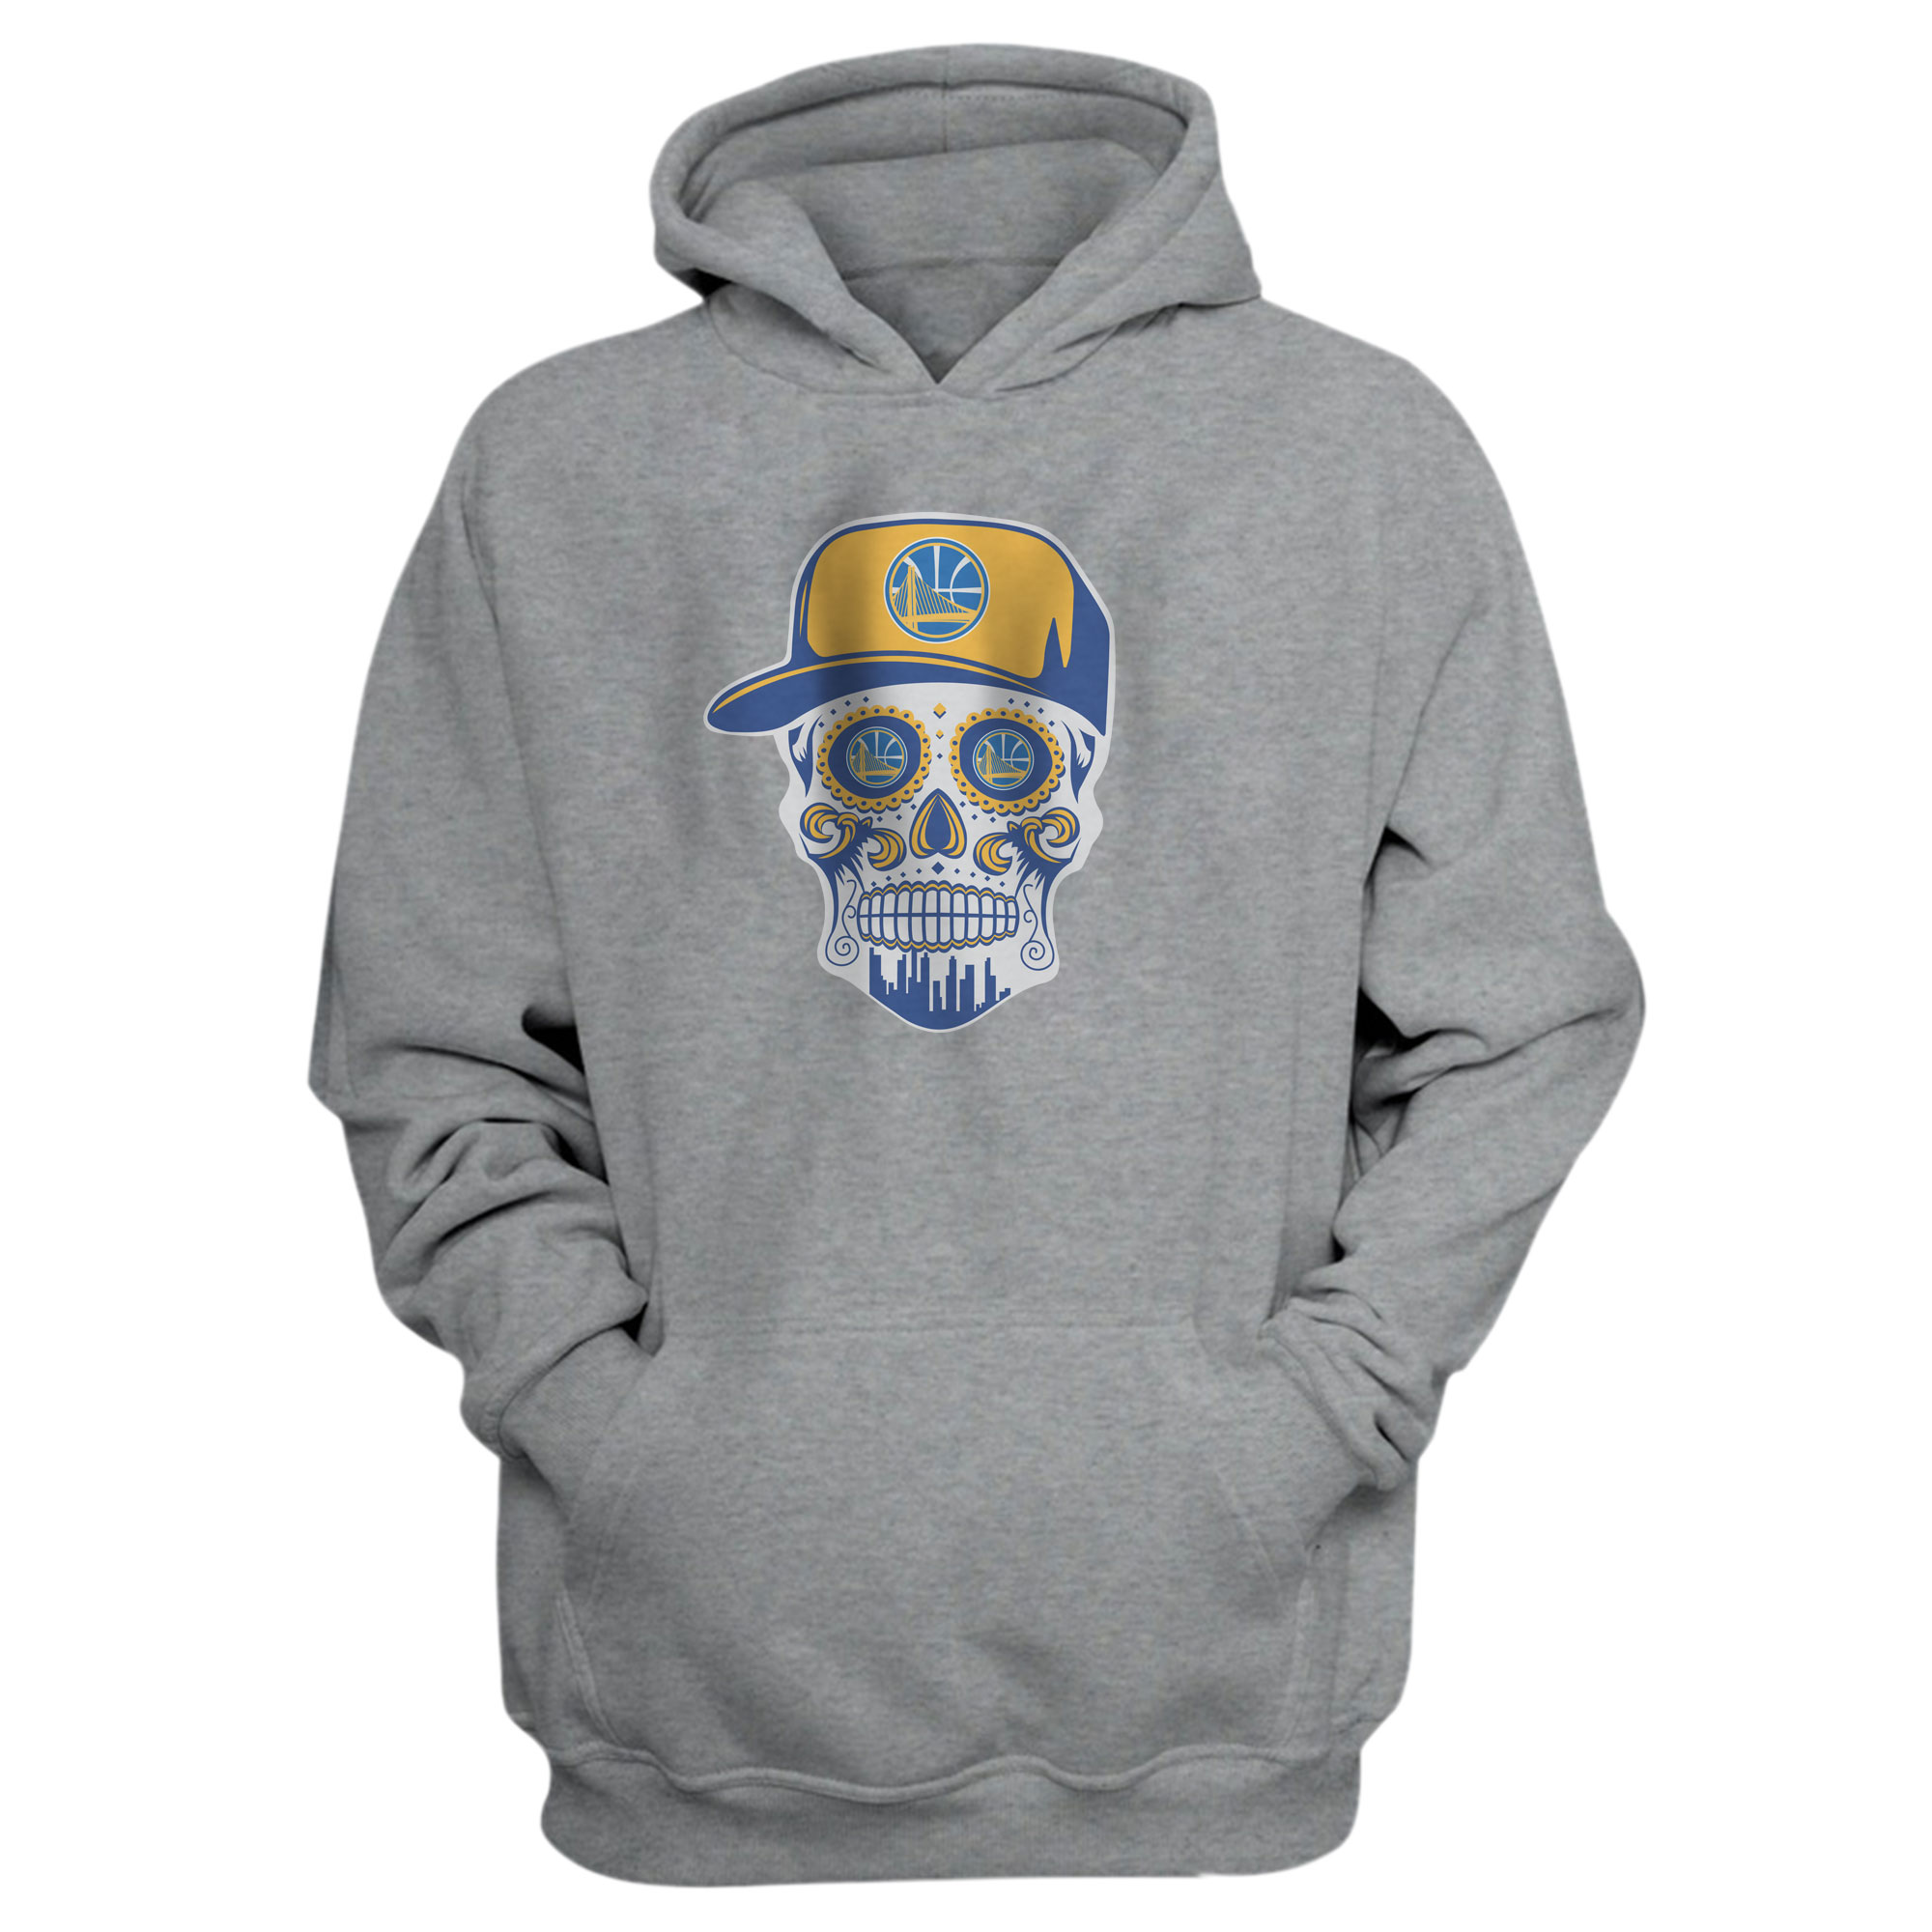 Warriors Skull Hoodie (HD-BLU-NP-452-NBA-GSW-SKULL)